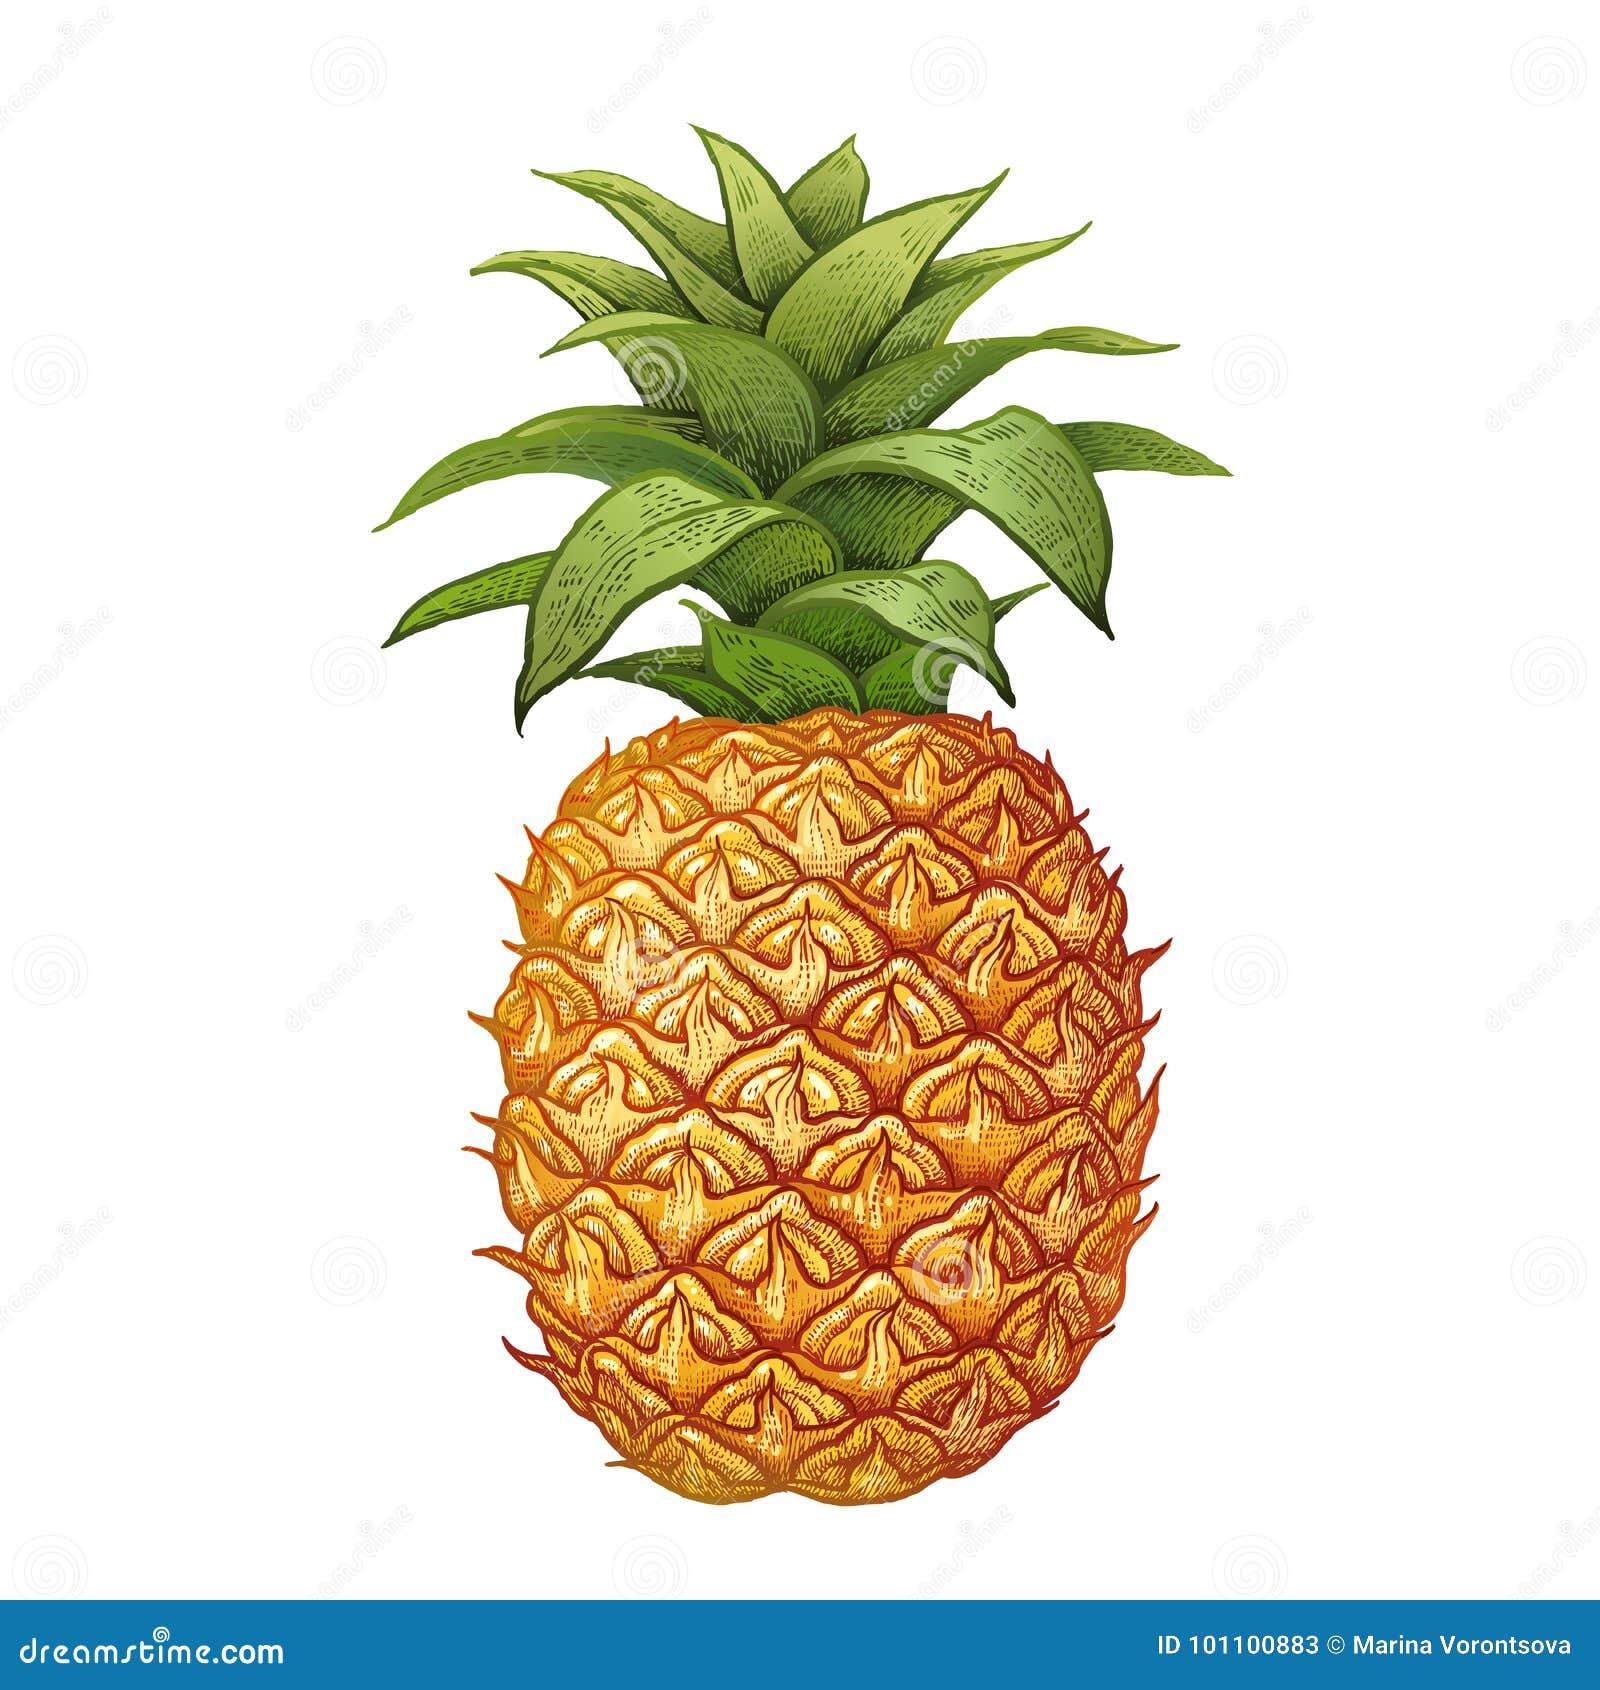 Ananas Rysunek realistyczny rysunek ananas ilustracja wektor - ilustracja